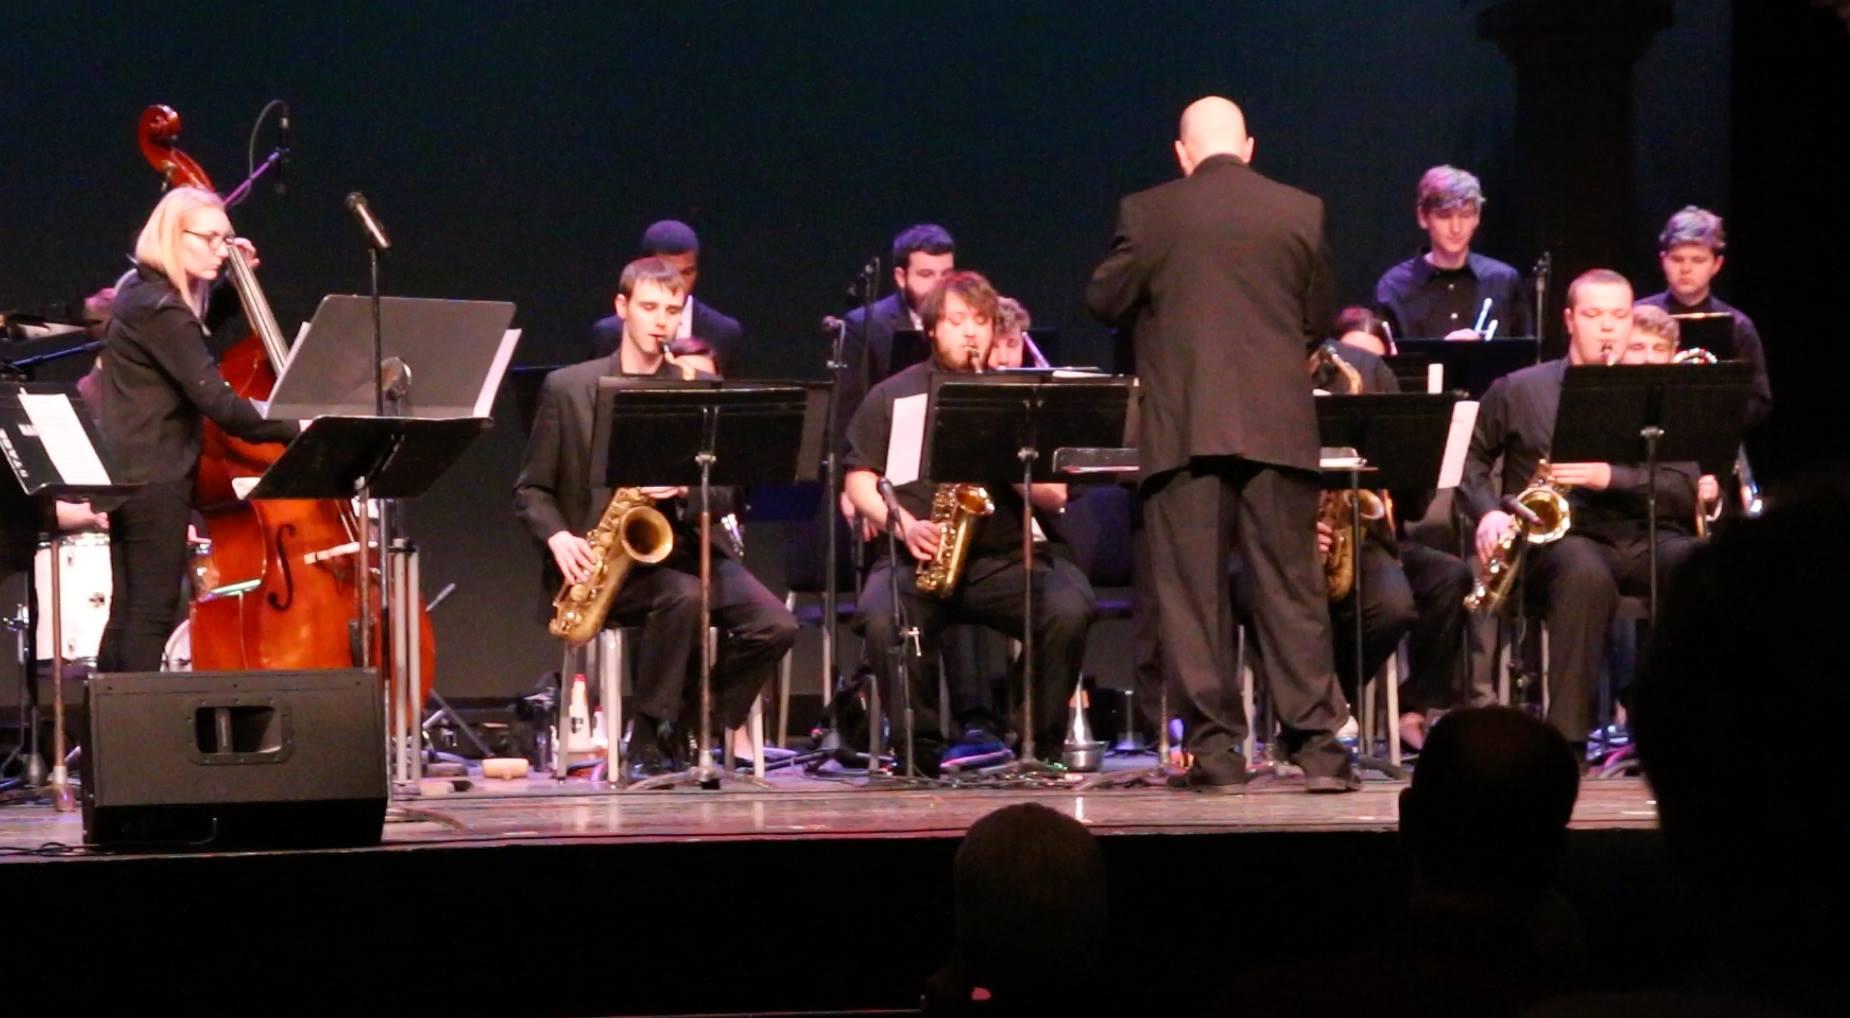 David Jumper conducts the Jazz Ambassadors.